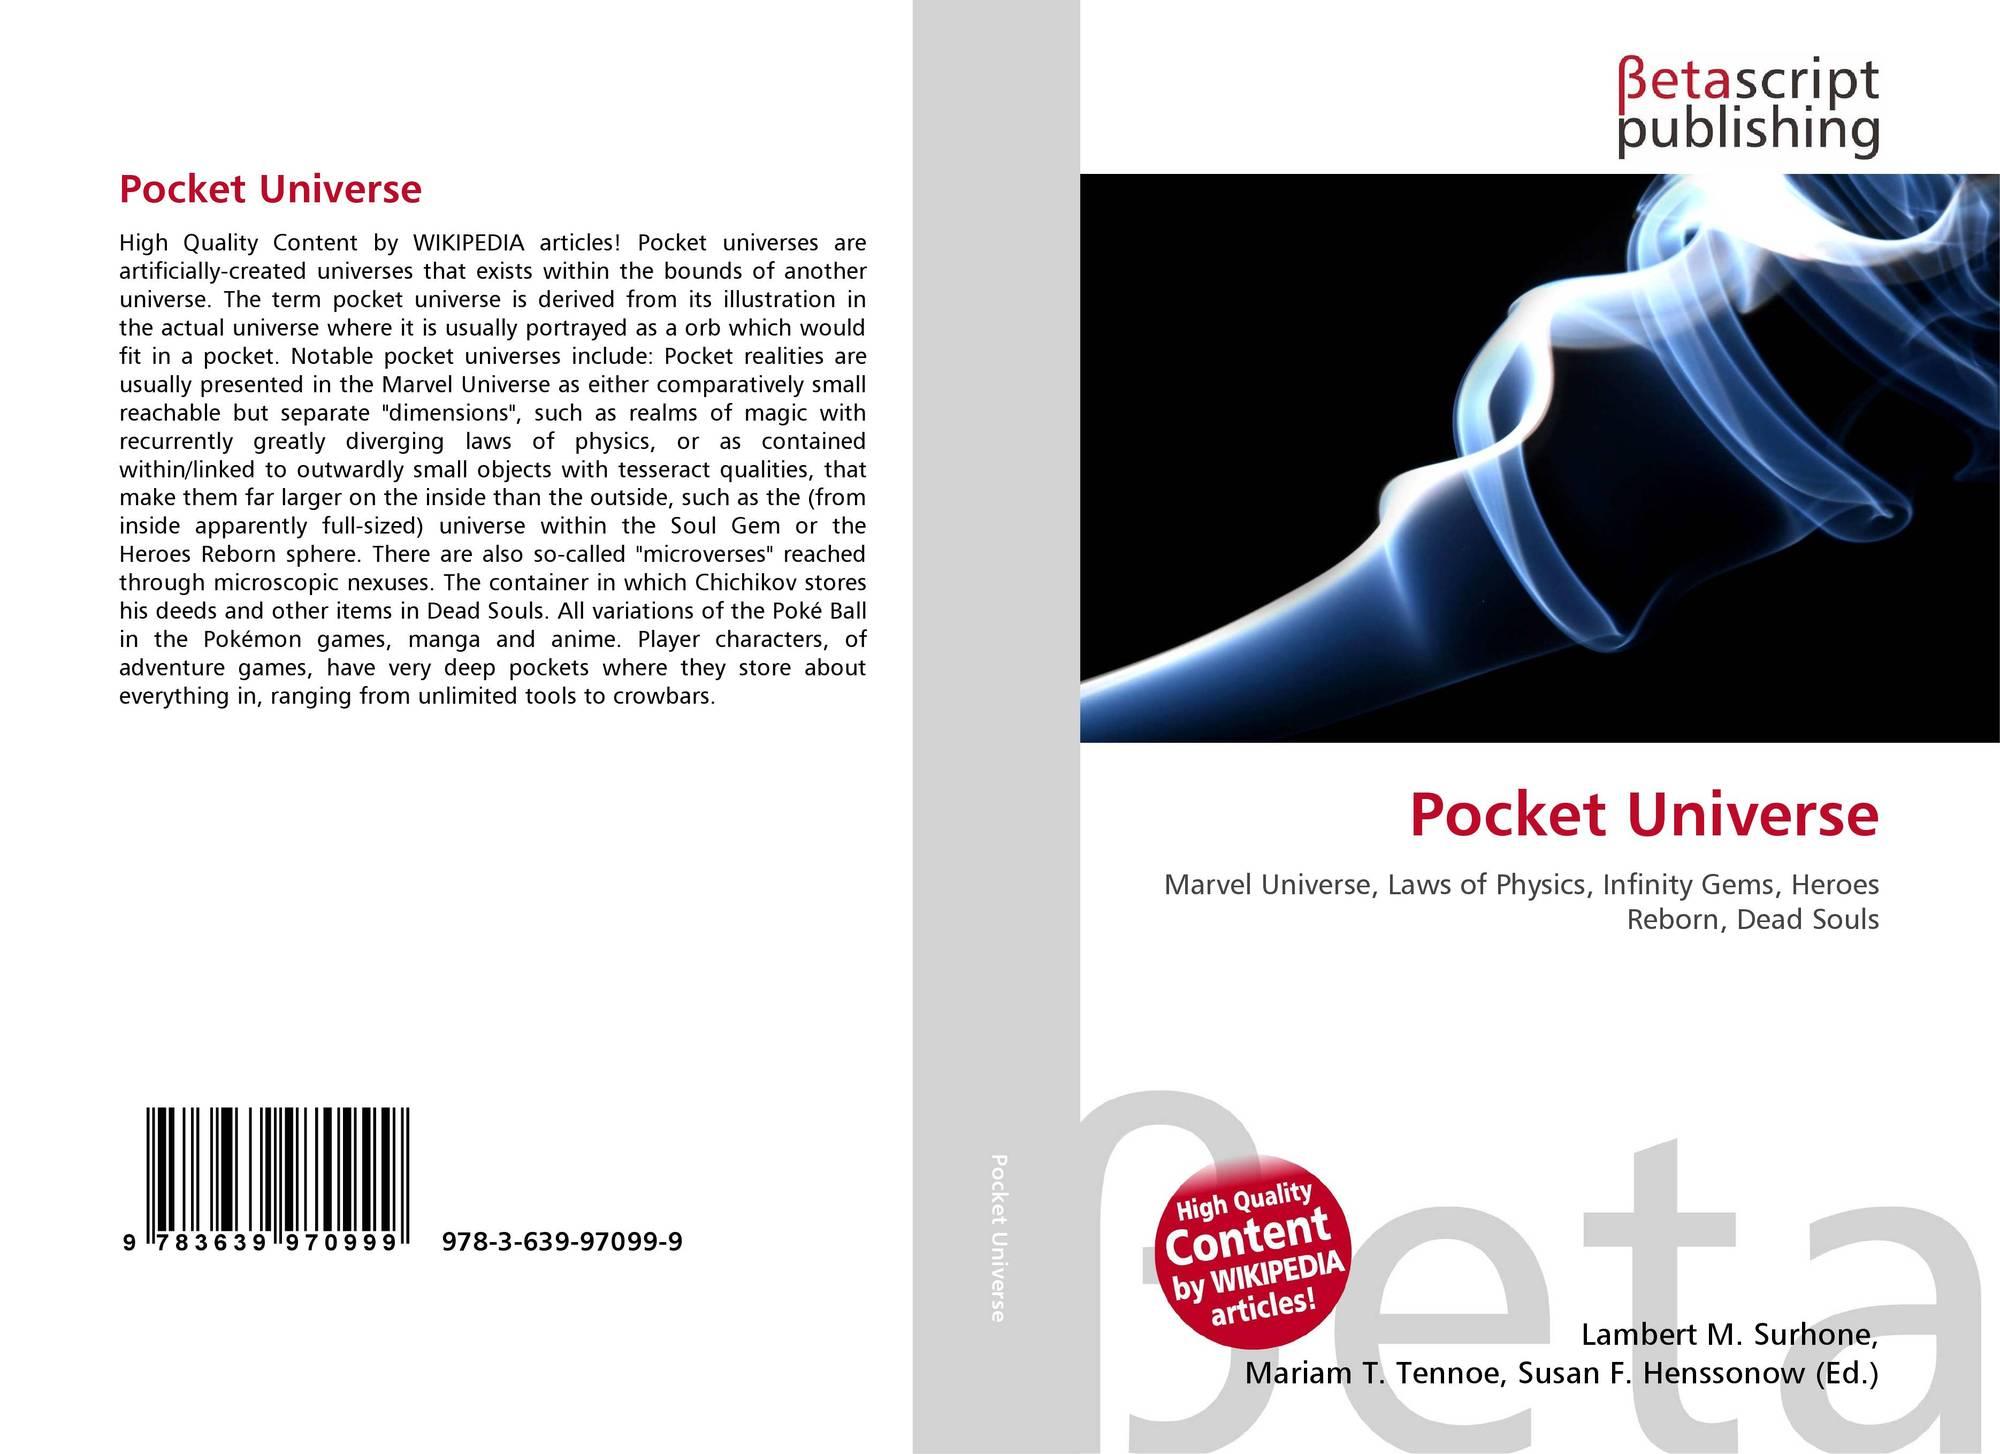 Pocket Universe, 978-3-639-97099-9, 3639970993 ,9783639970999